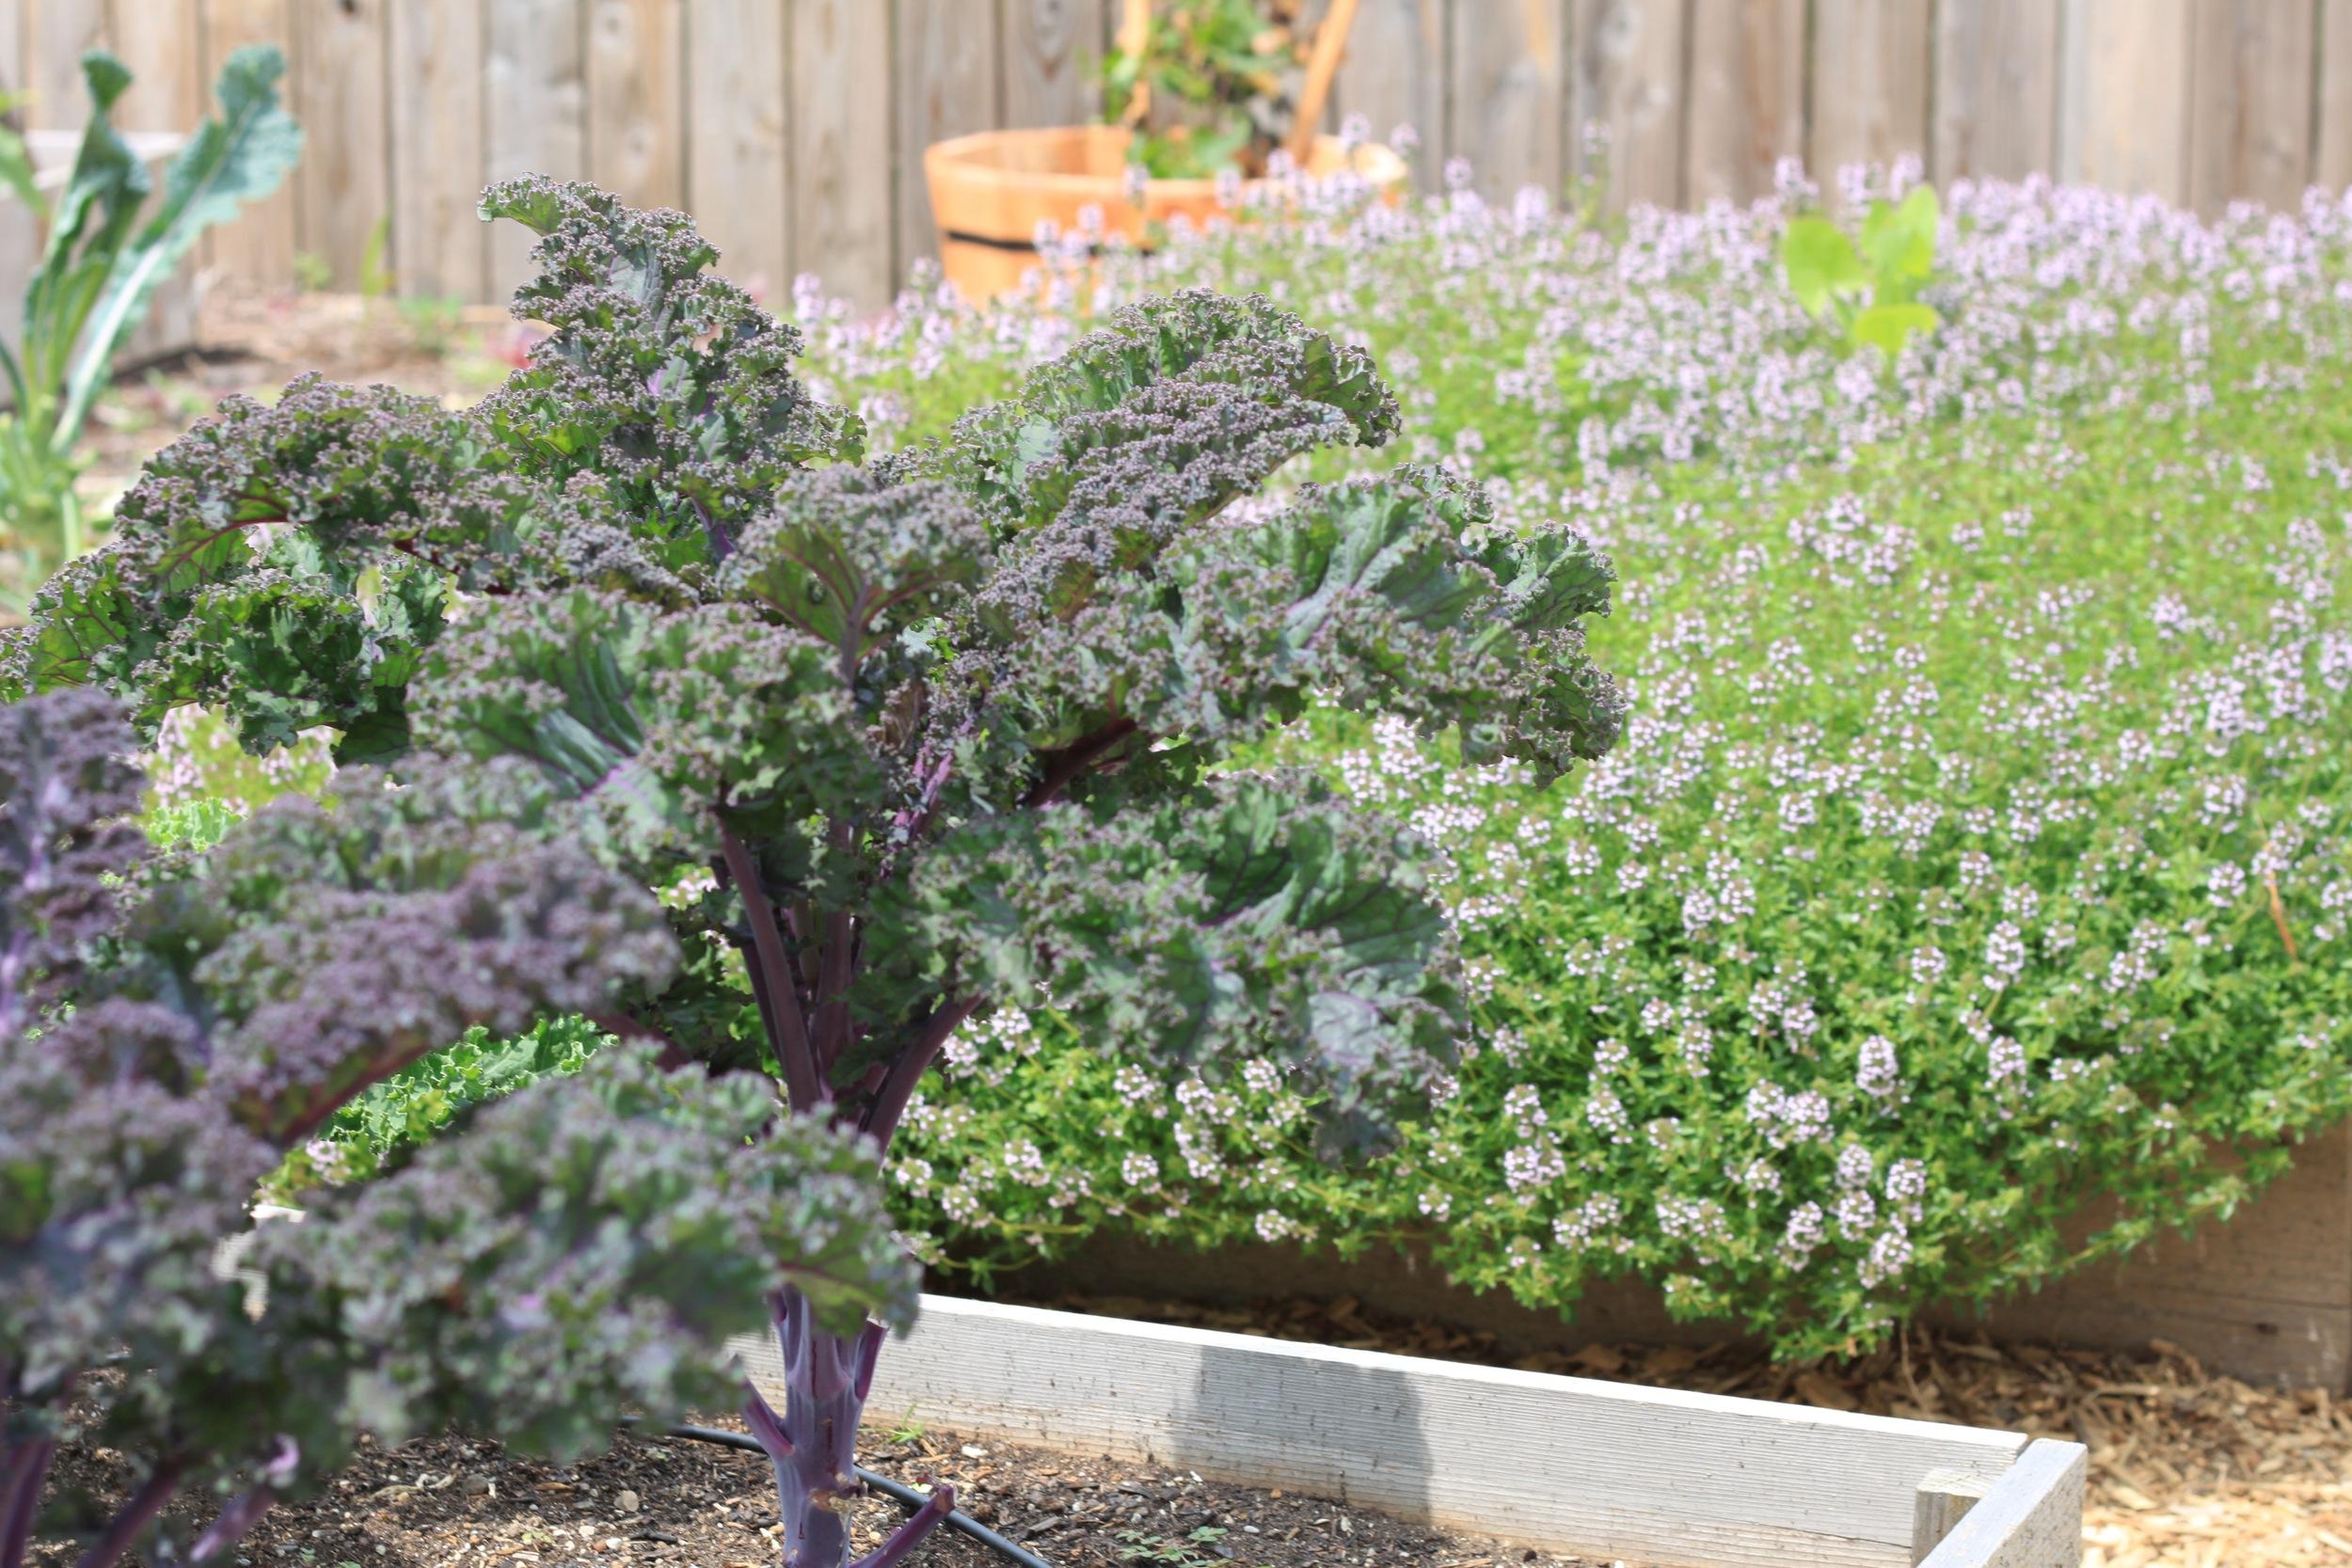 Big-Delicious-Planet-urban-organic-garden-in-West-Town